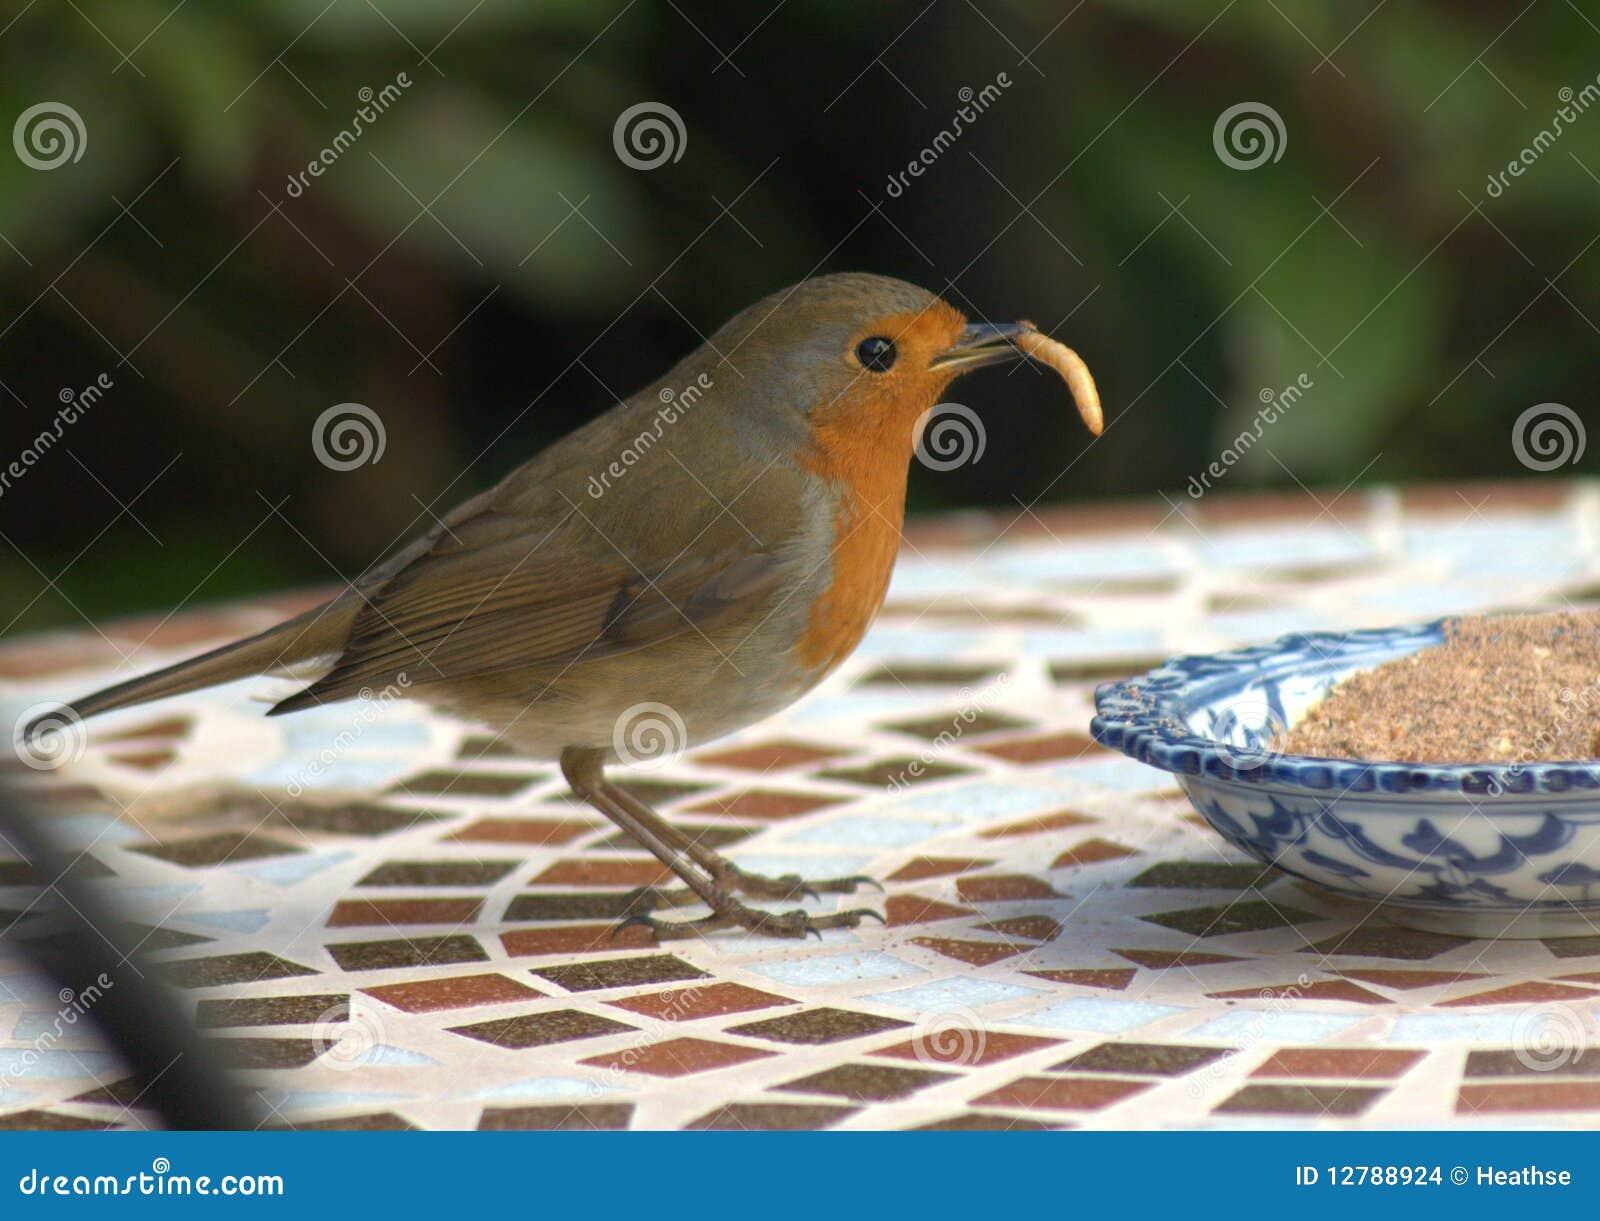 Robin With Worm Stock Photo Cartoondealer Com 25899552